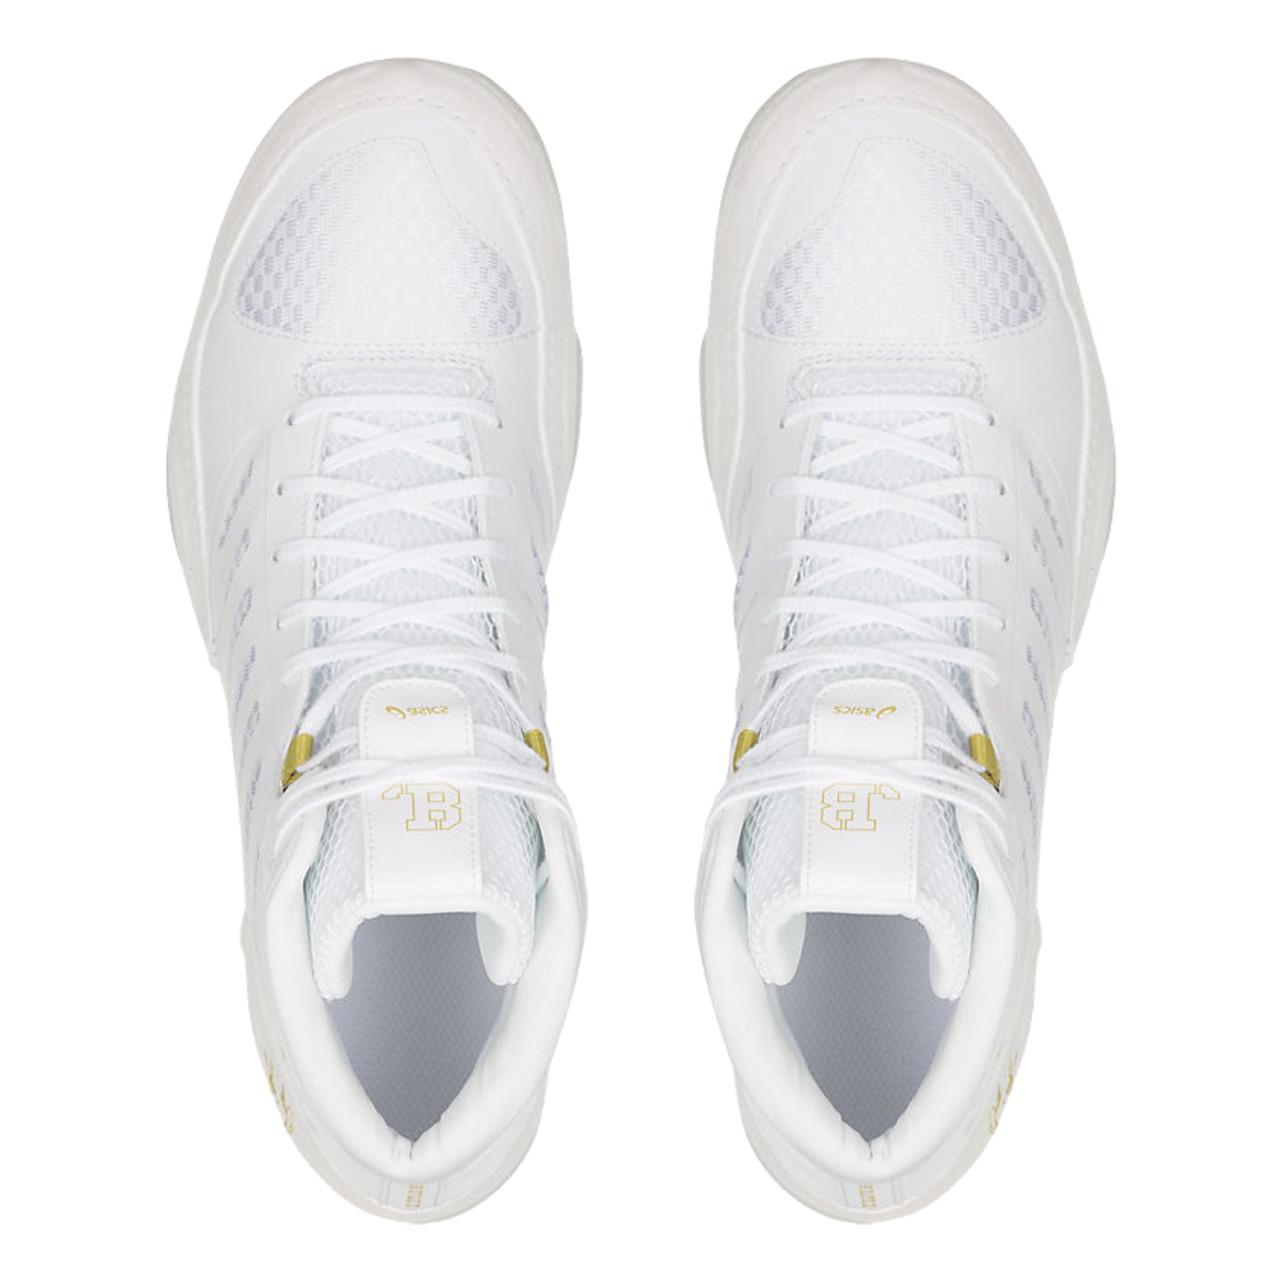 separation shoes a1b41 04495 ... Asics JB Elite III Men s Wrestling Shoes ...